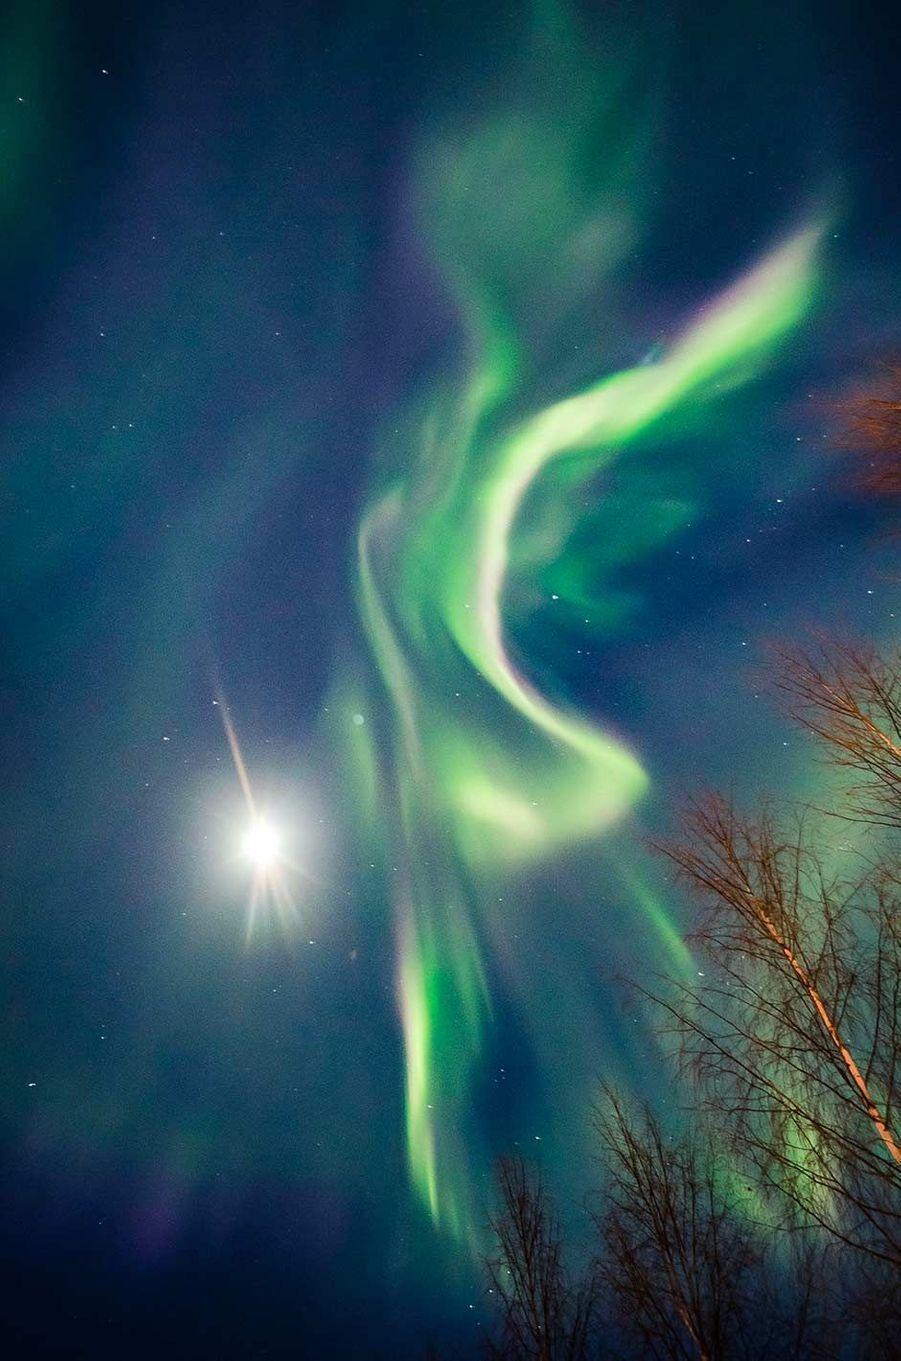 Aurores boréales àRovaniemi, en Finlande, le 6 février 2020.